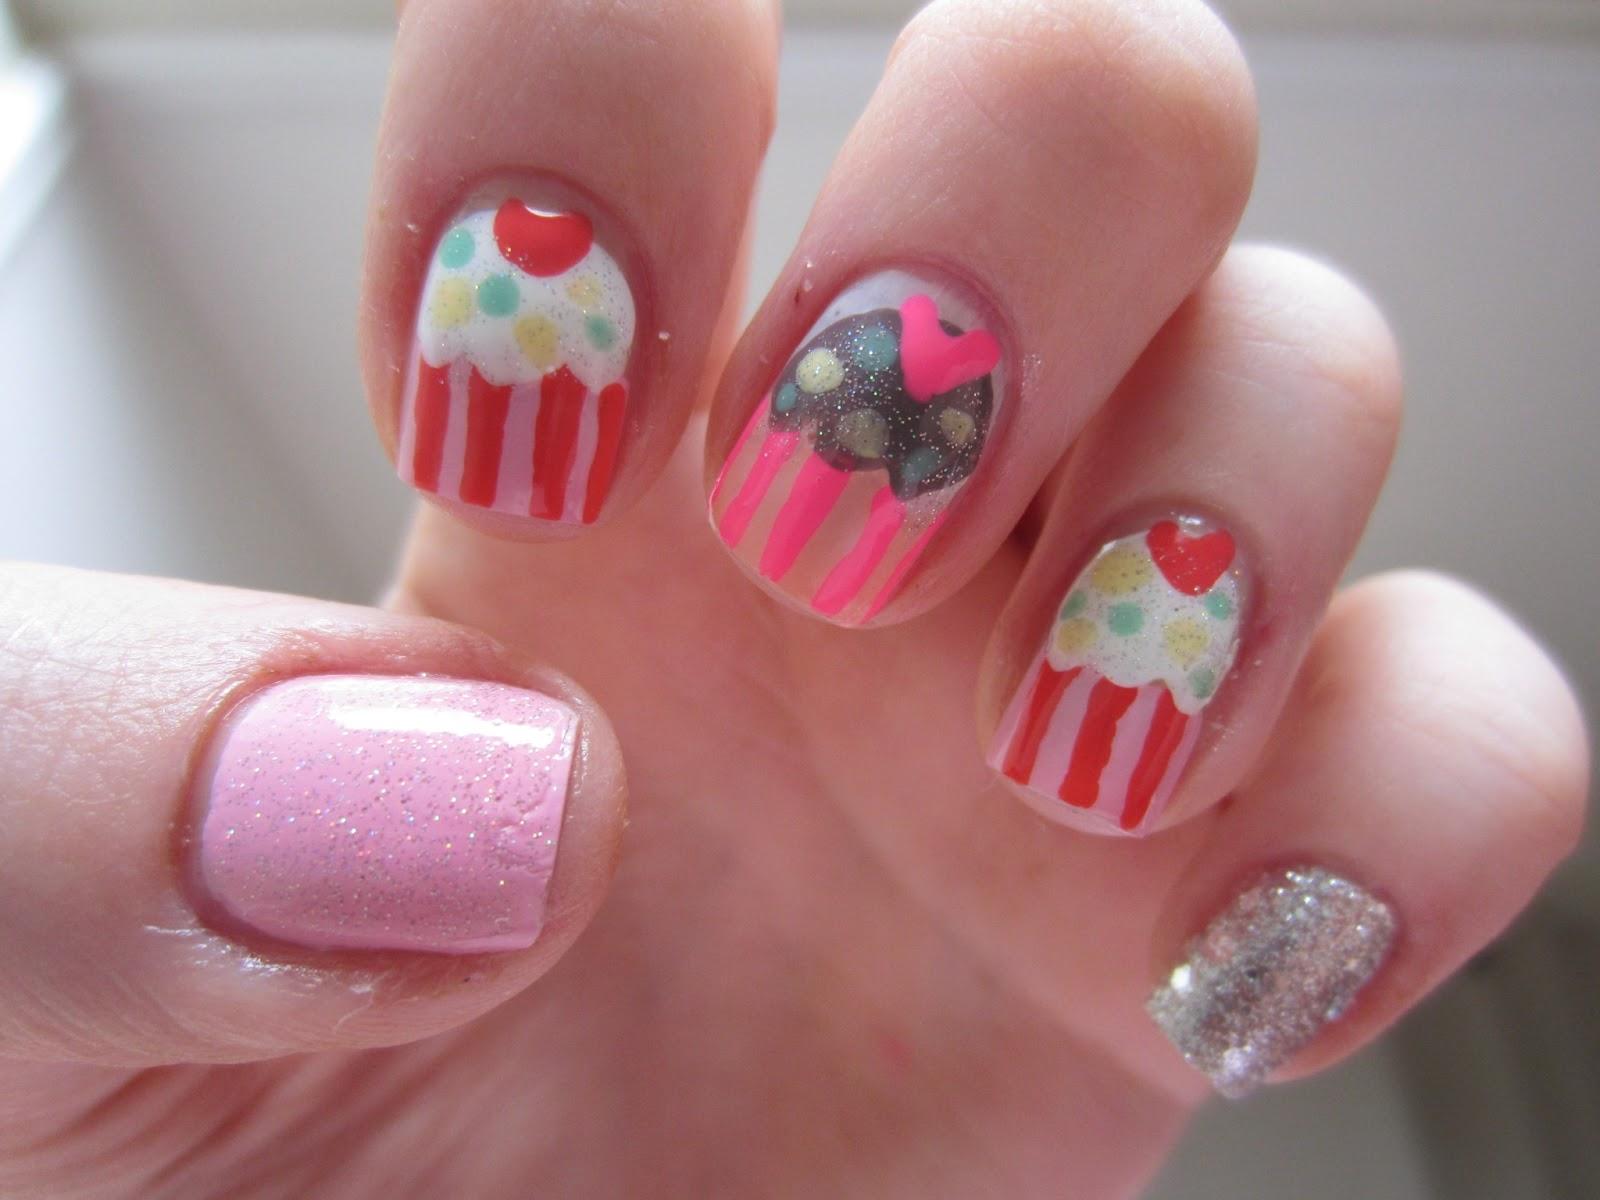 Nail art dotting tool on my other nails nailartdesignsidea info via